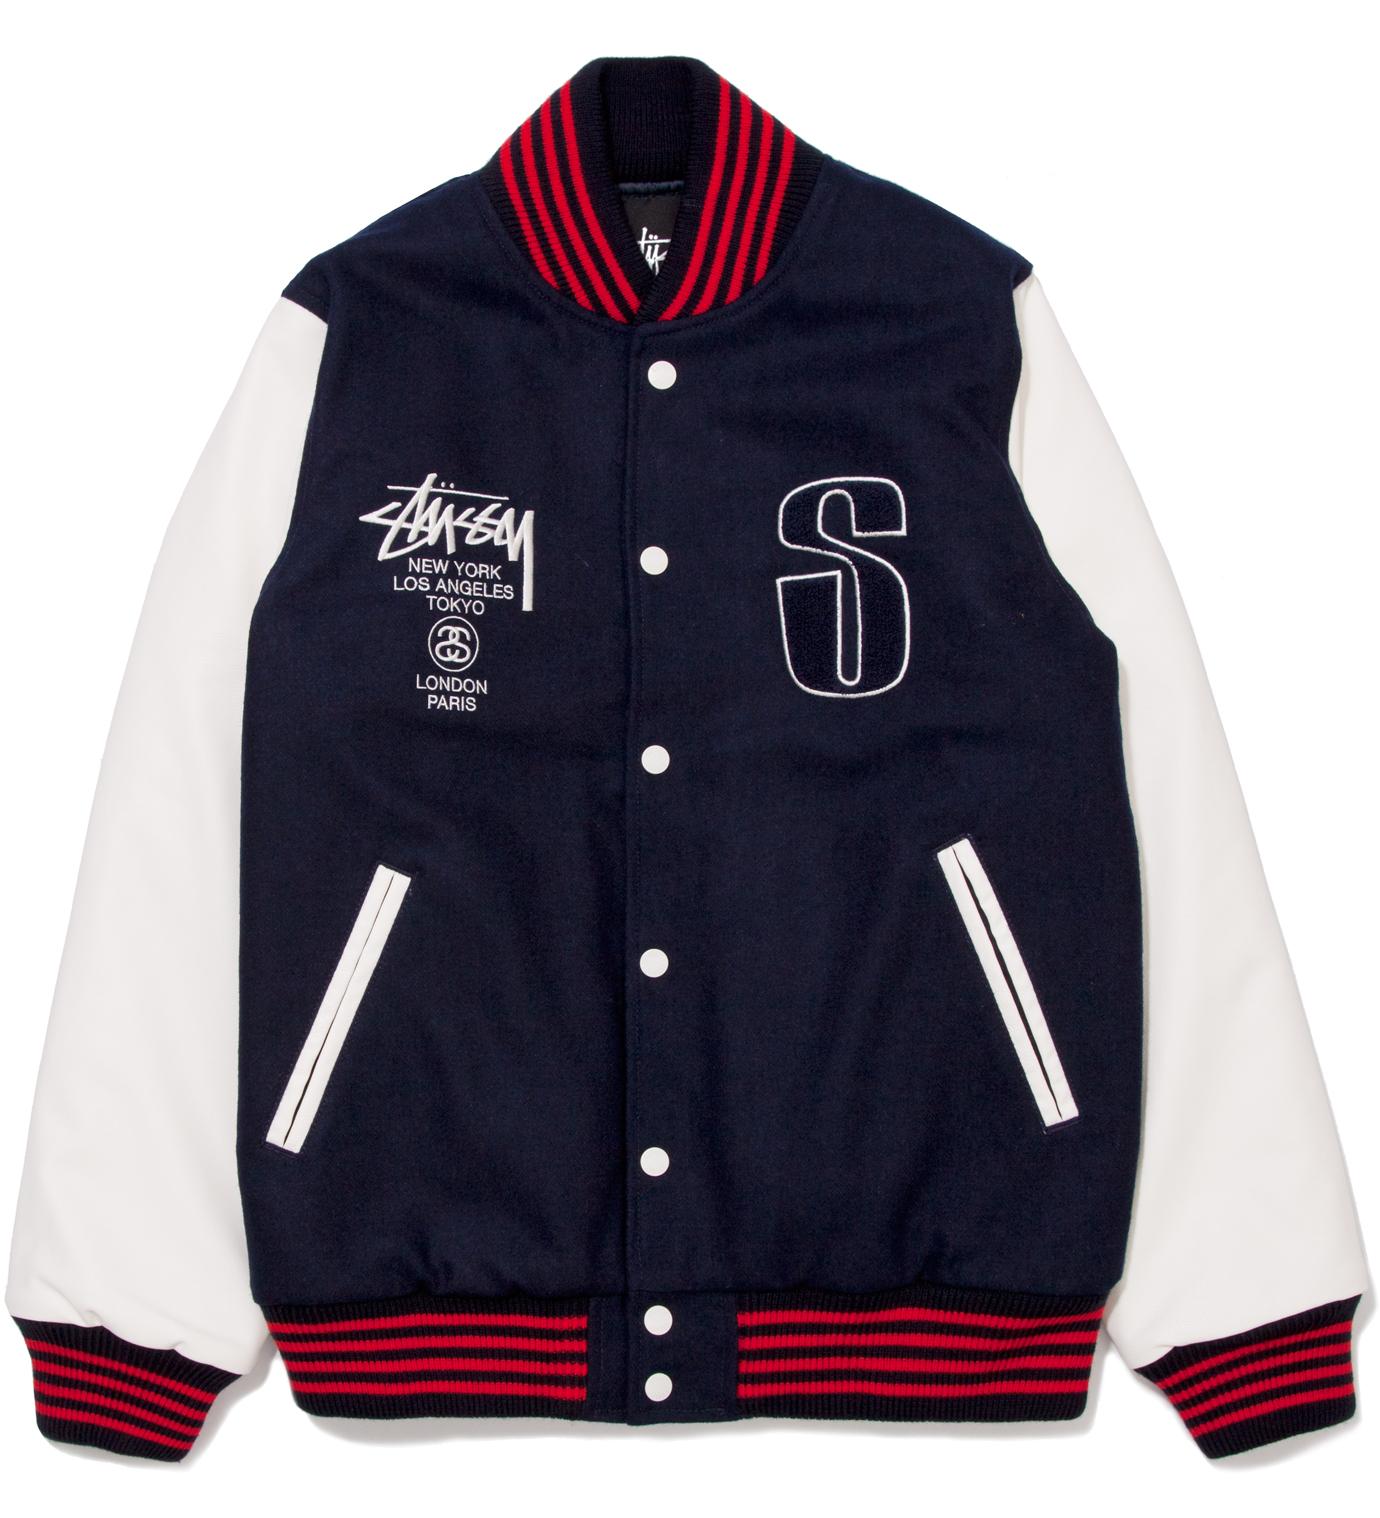 Stussy Navy Lettermans Jacket